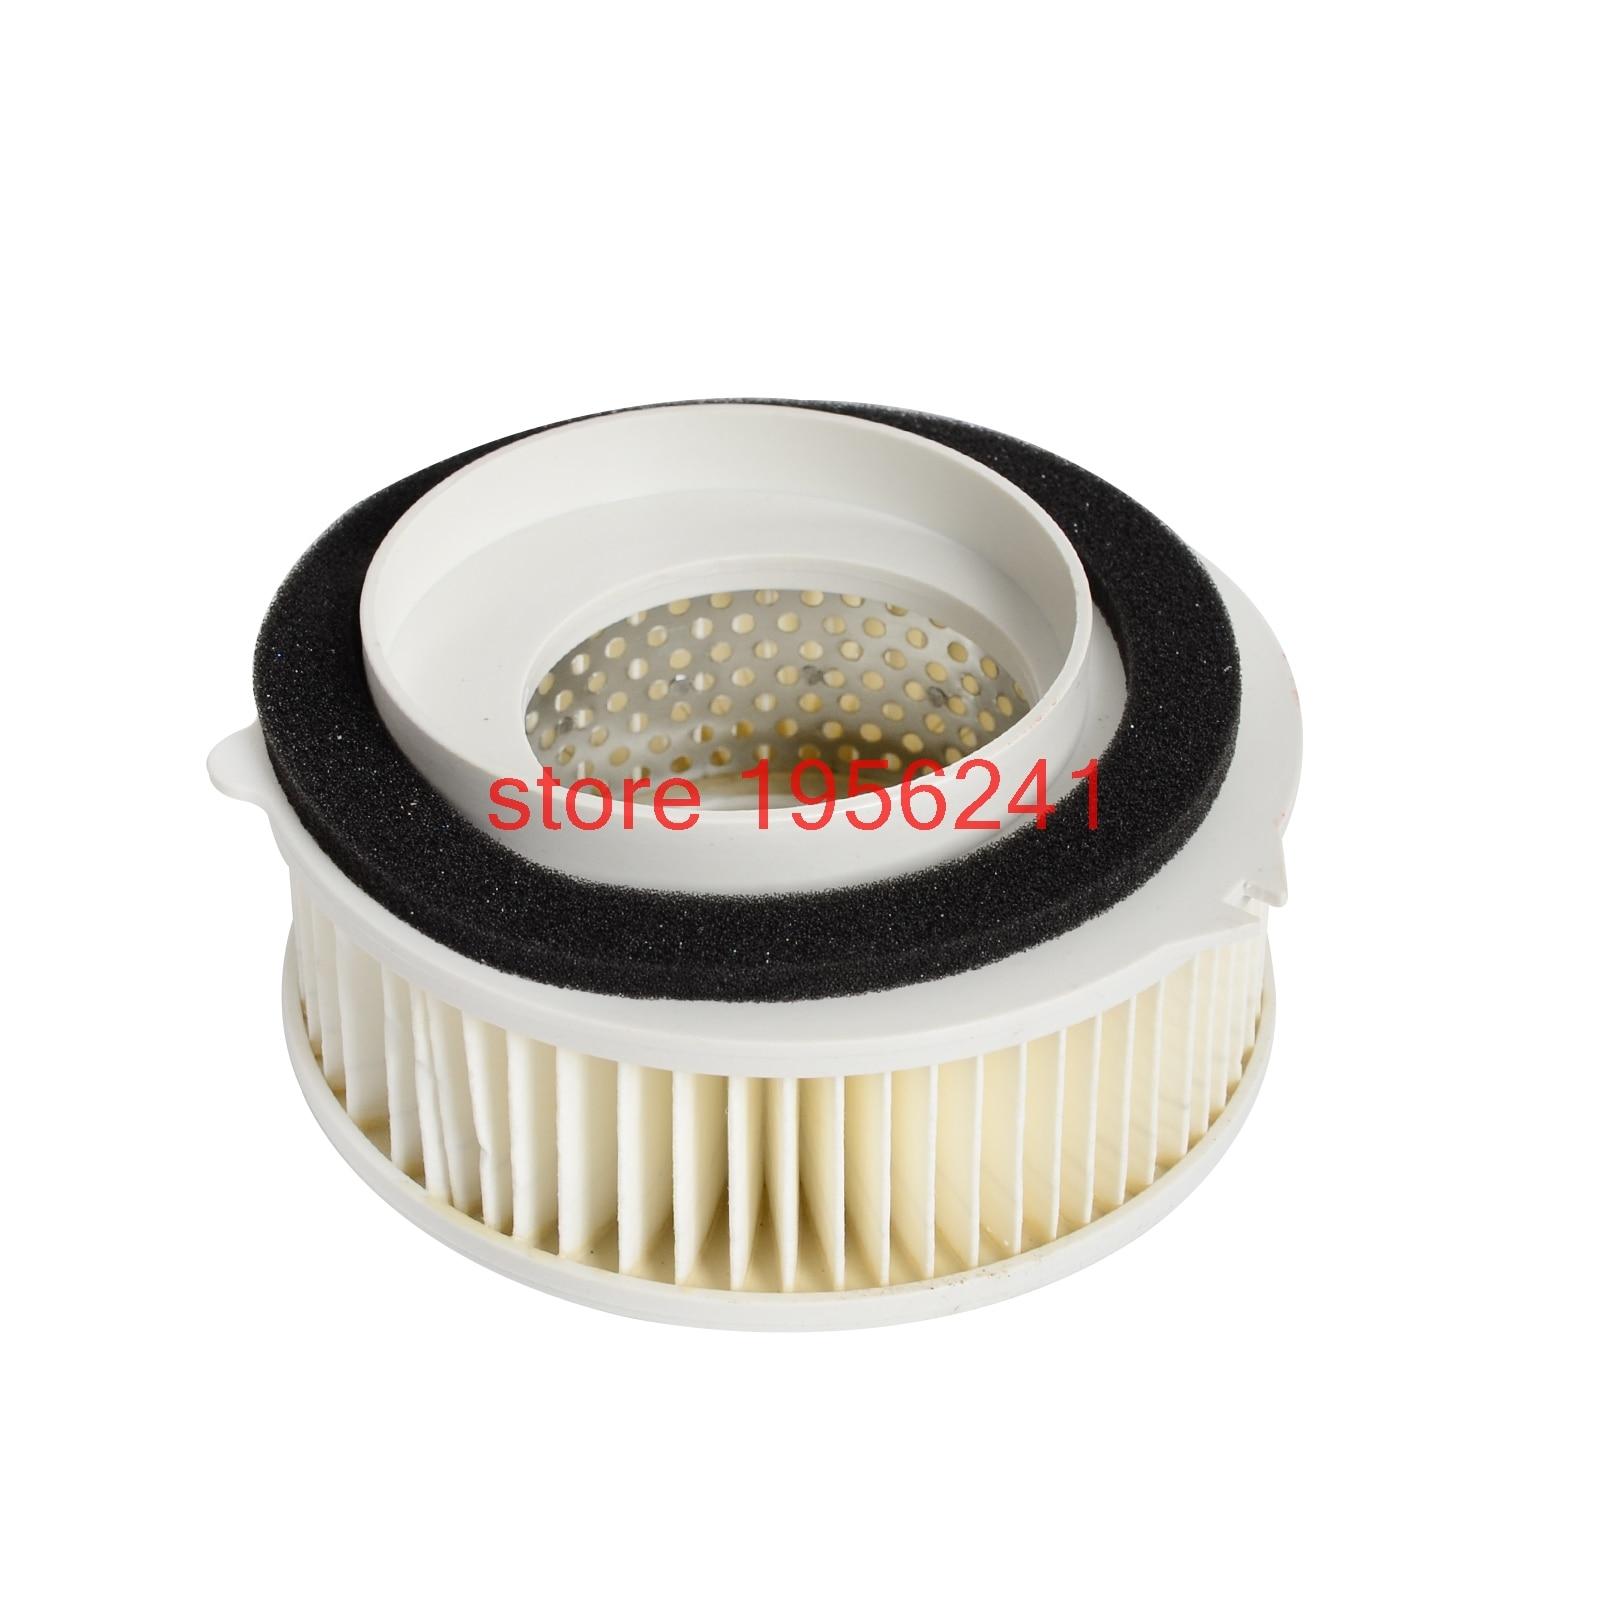 Motorcycle Air Cleaner Filter For Yamaha XVS400 1996-2016 XVS650 1997-2016 XVS 400 650 NEW